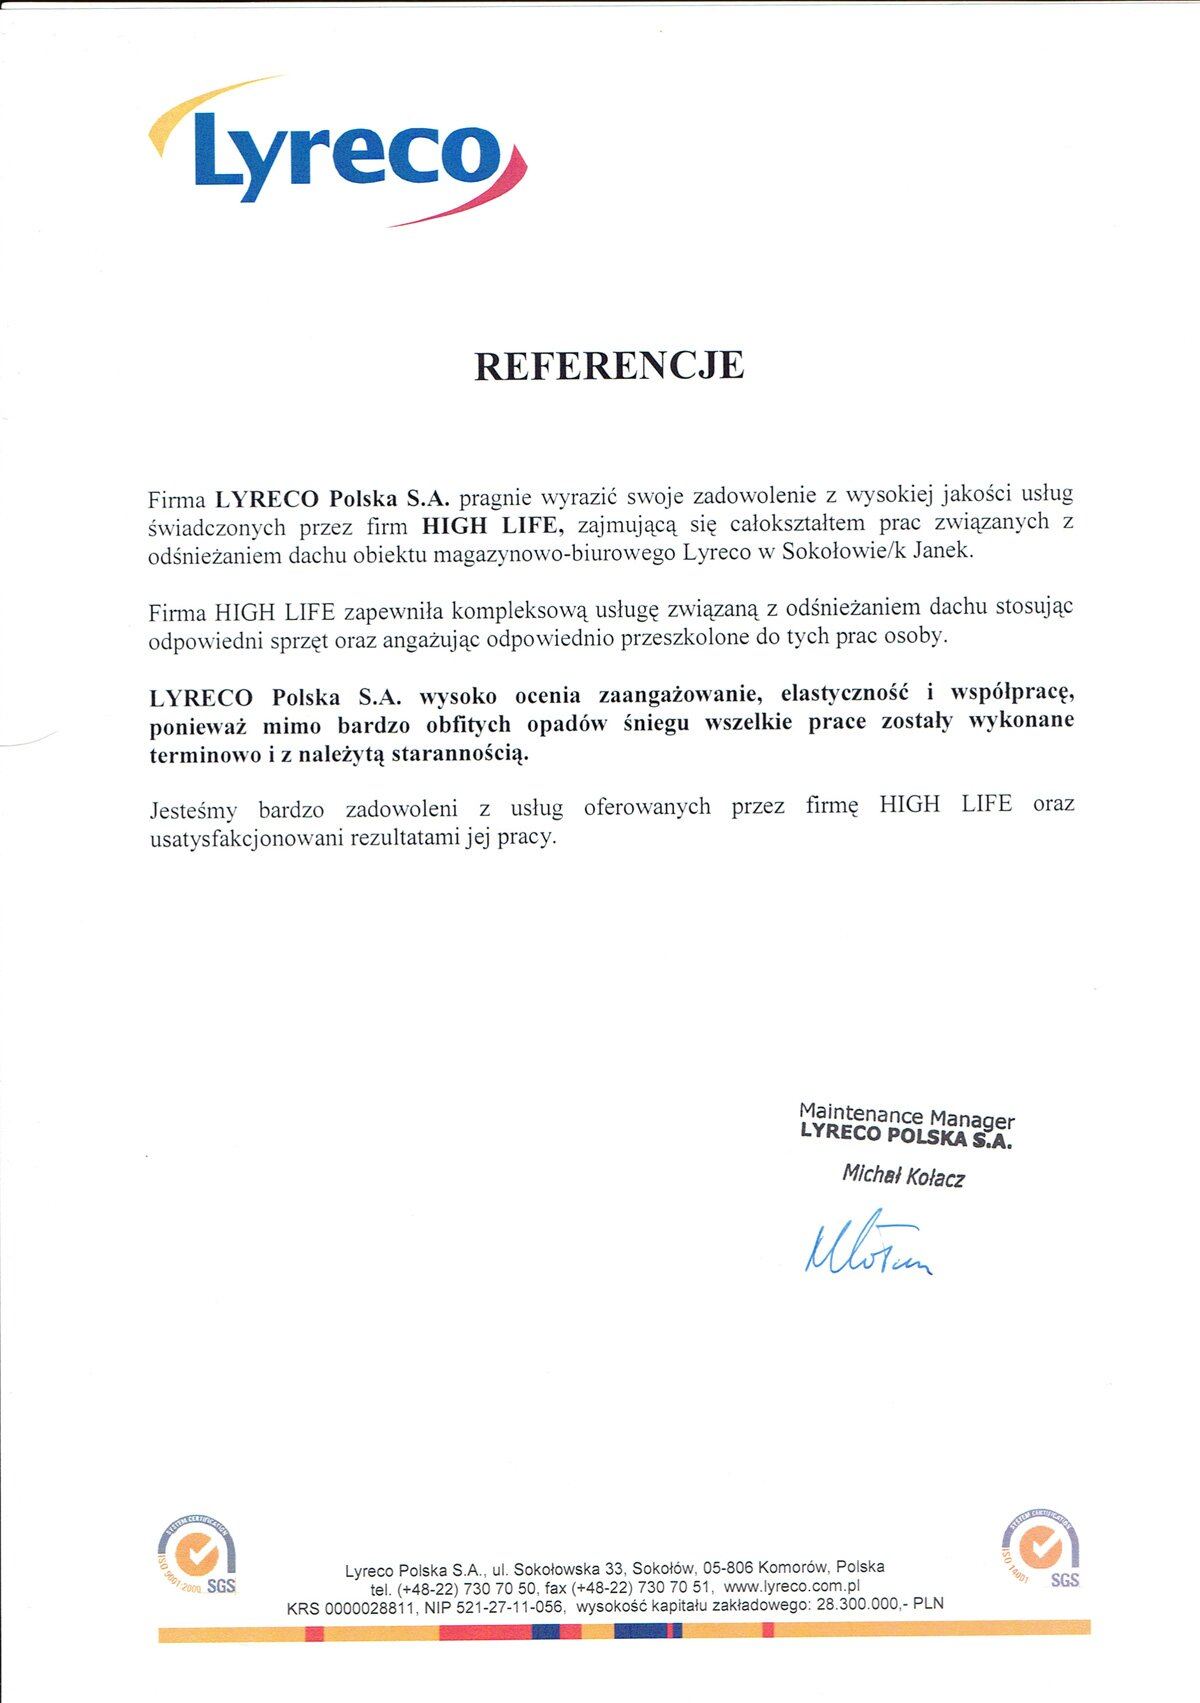 Lyreco—referencje